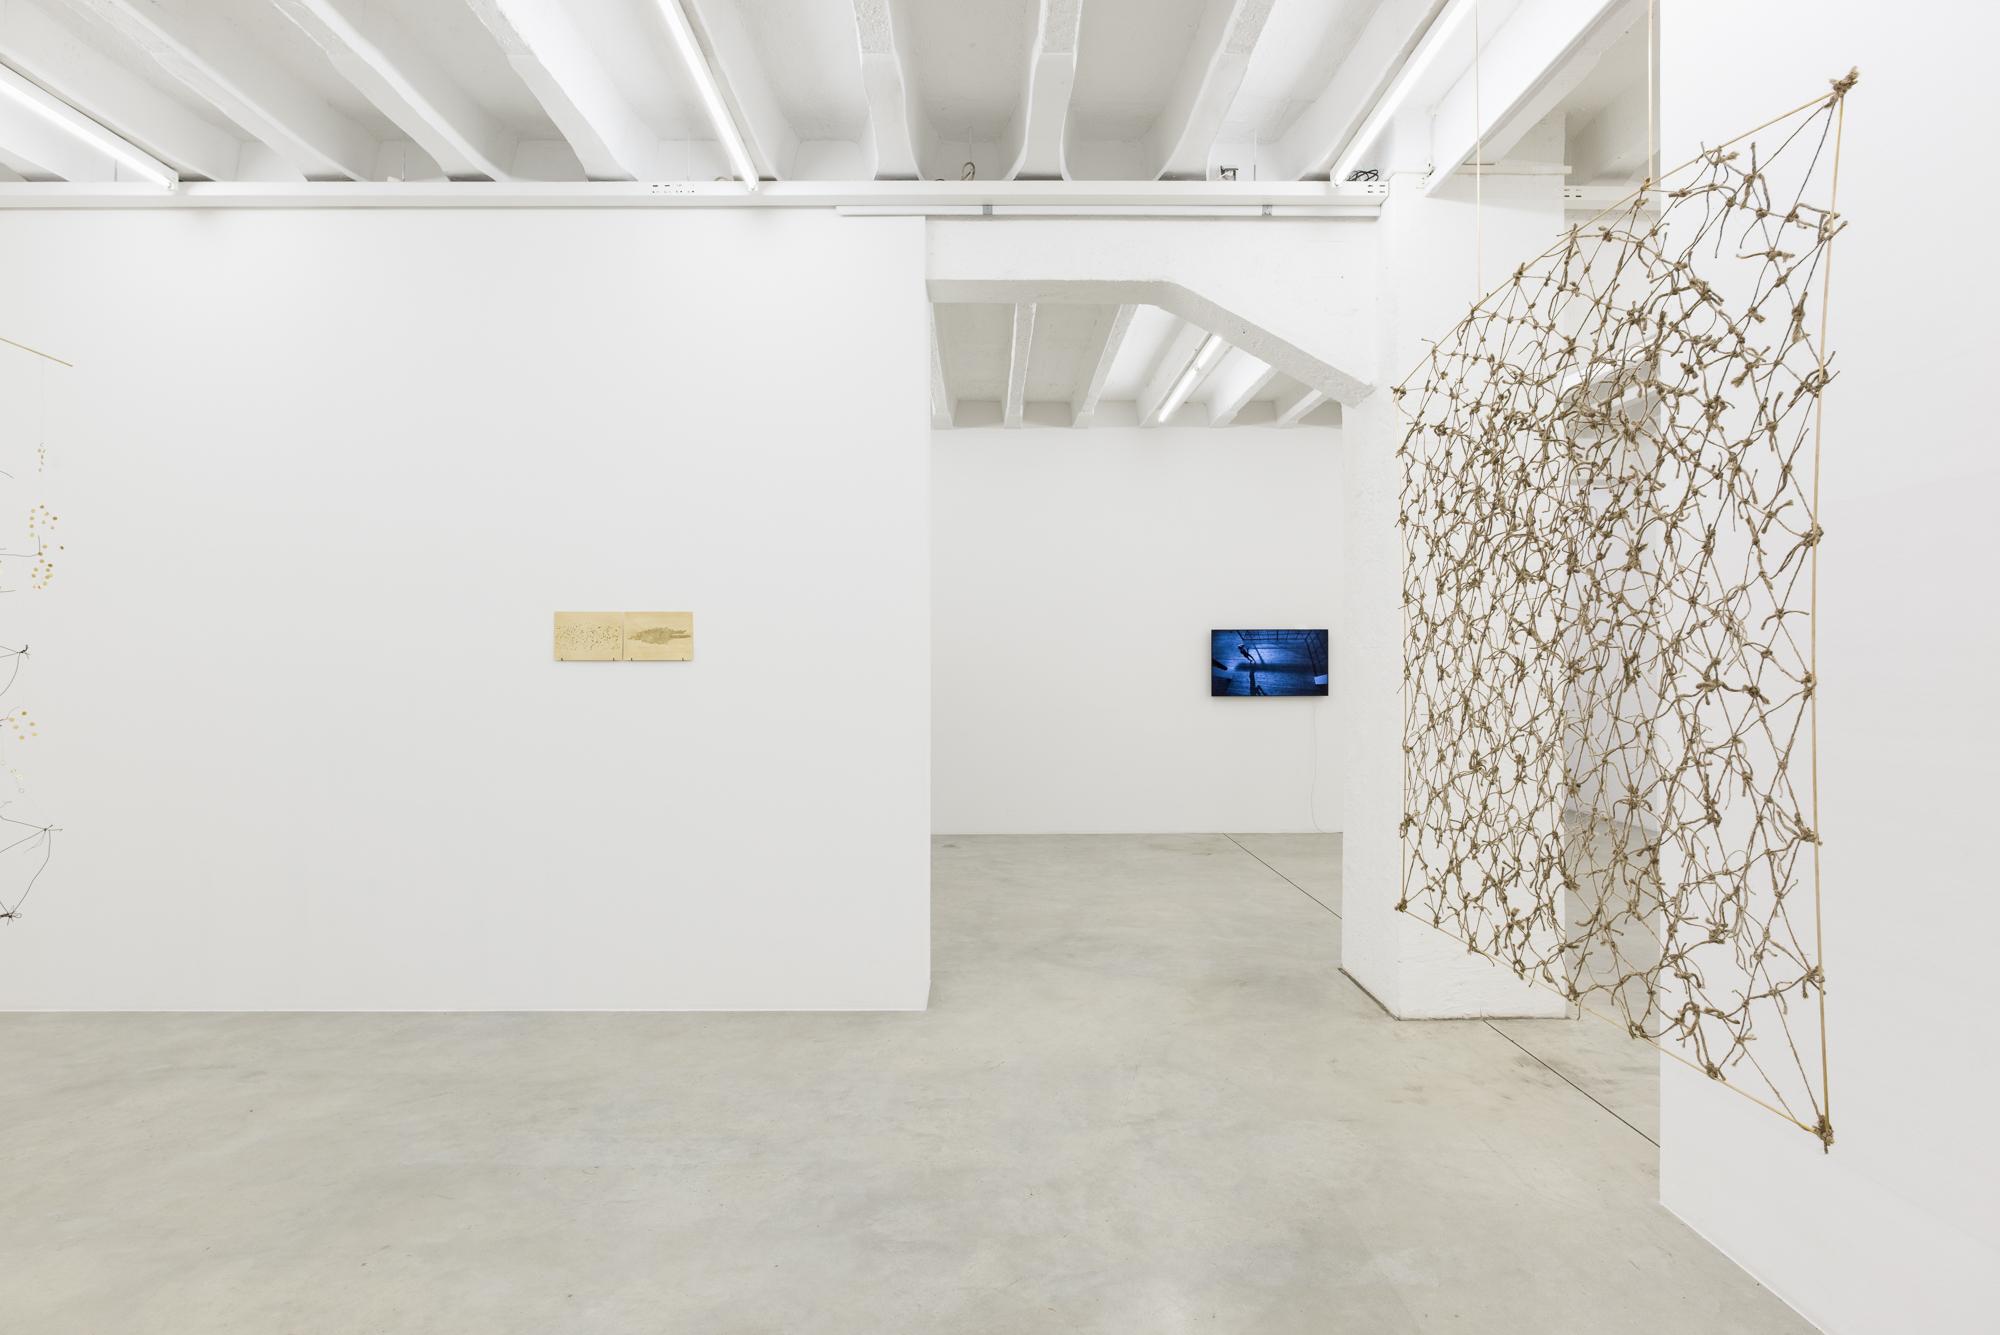 Iza Tarasewicz, Equilibrium in Meteors, exhibition view, Galerija Gregor Podnar, Berlin, 2018. Photo: Marcus Schneider